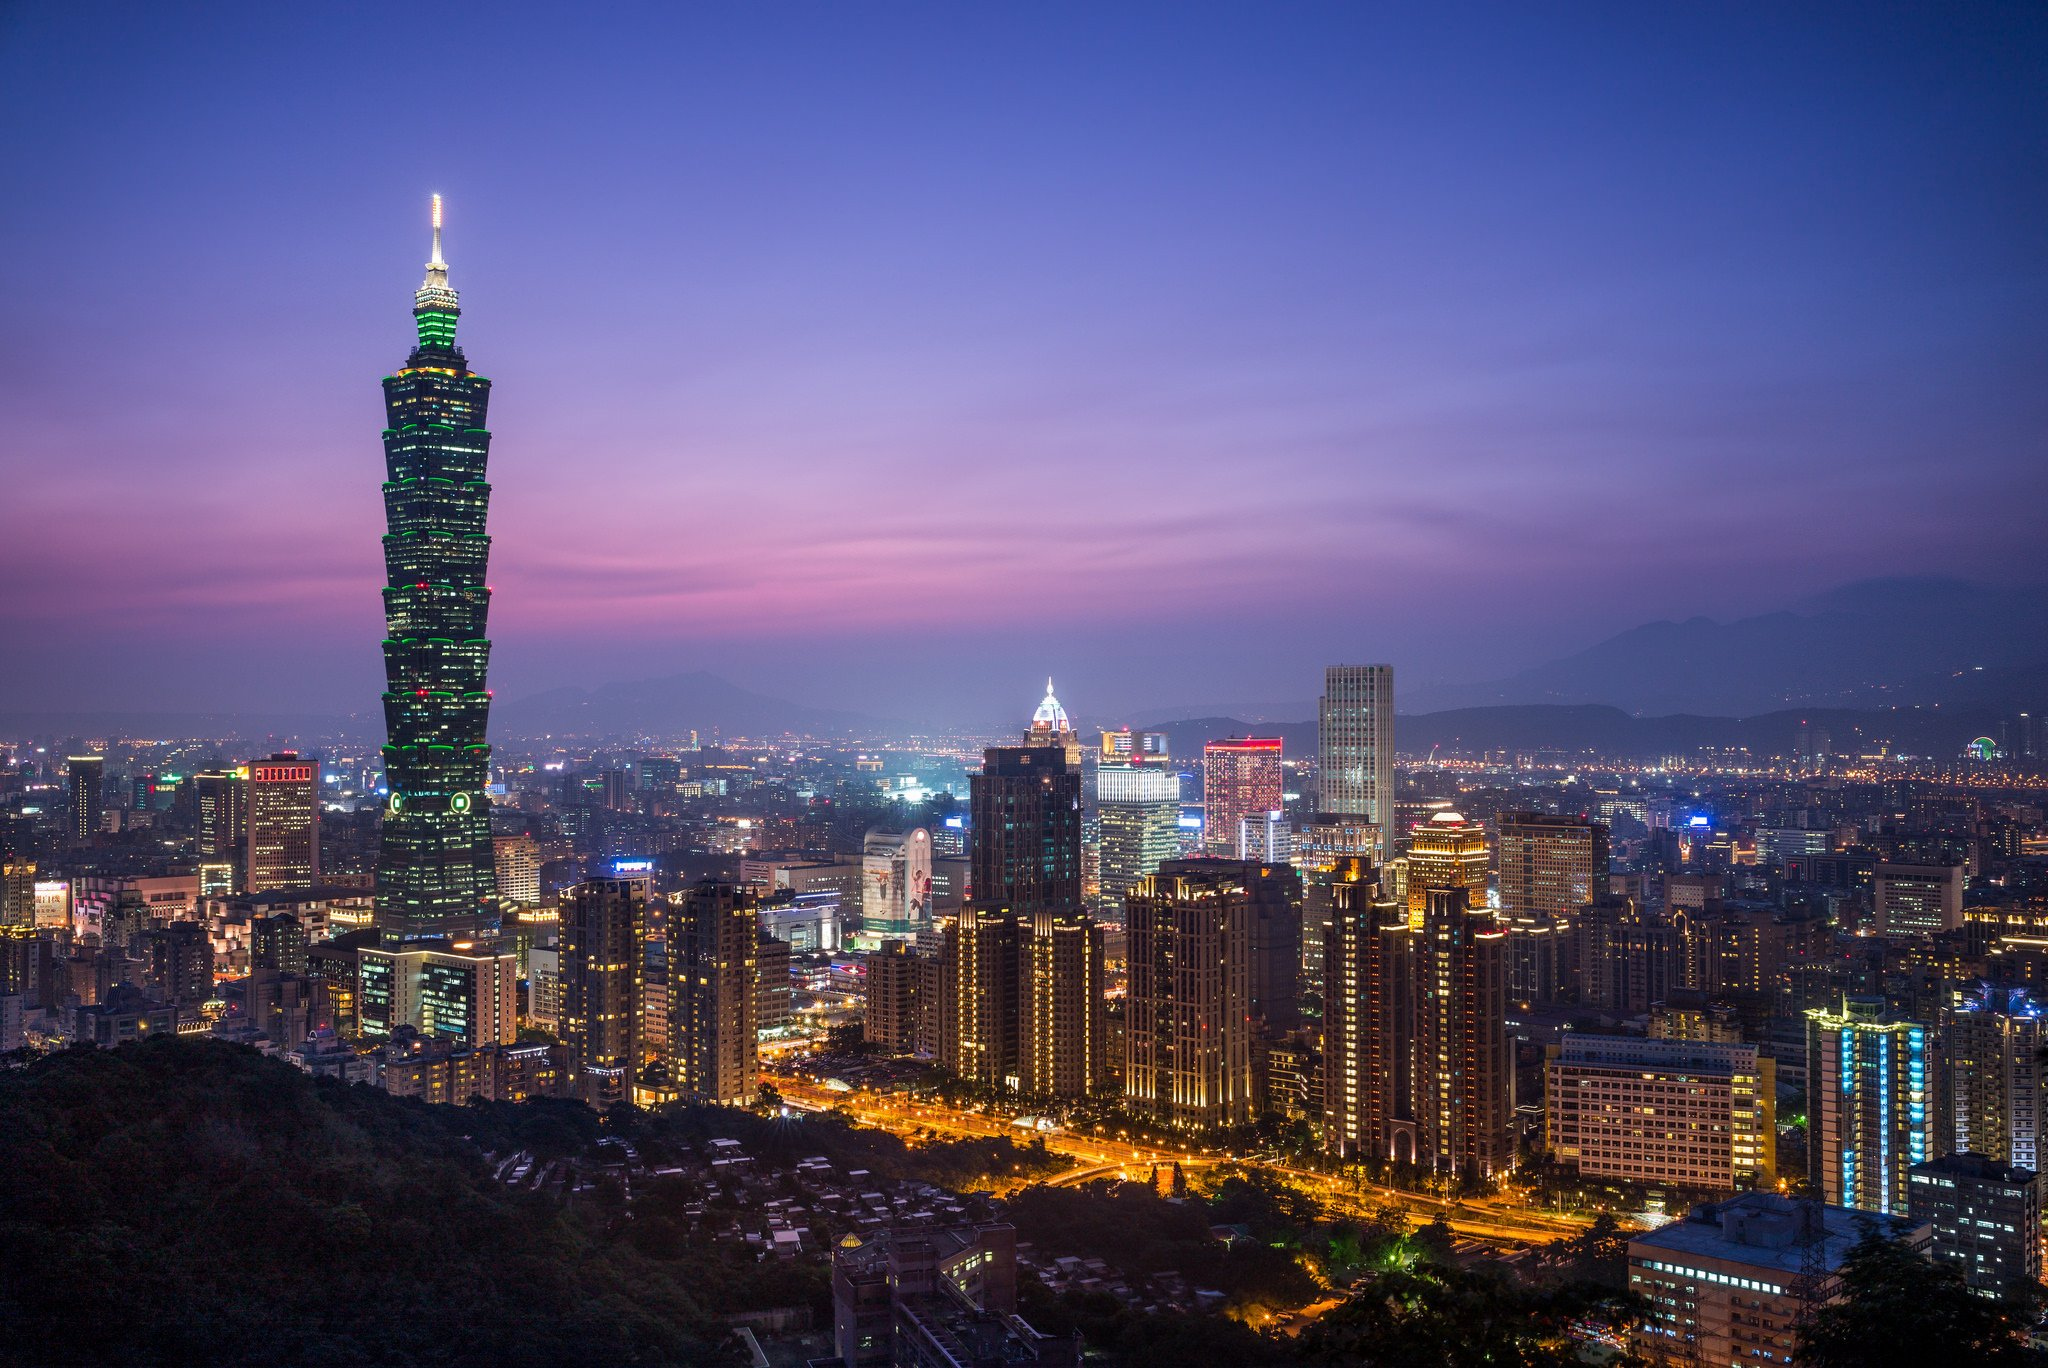 Brooklyn Bridge Wallpaper Black And White China Taiwan Taipei Sunset Evening Night City Lilac Purple